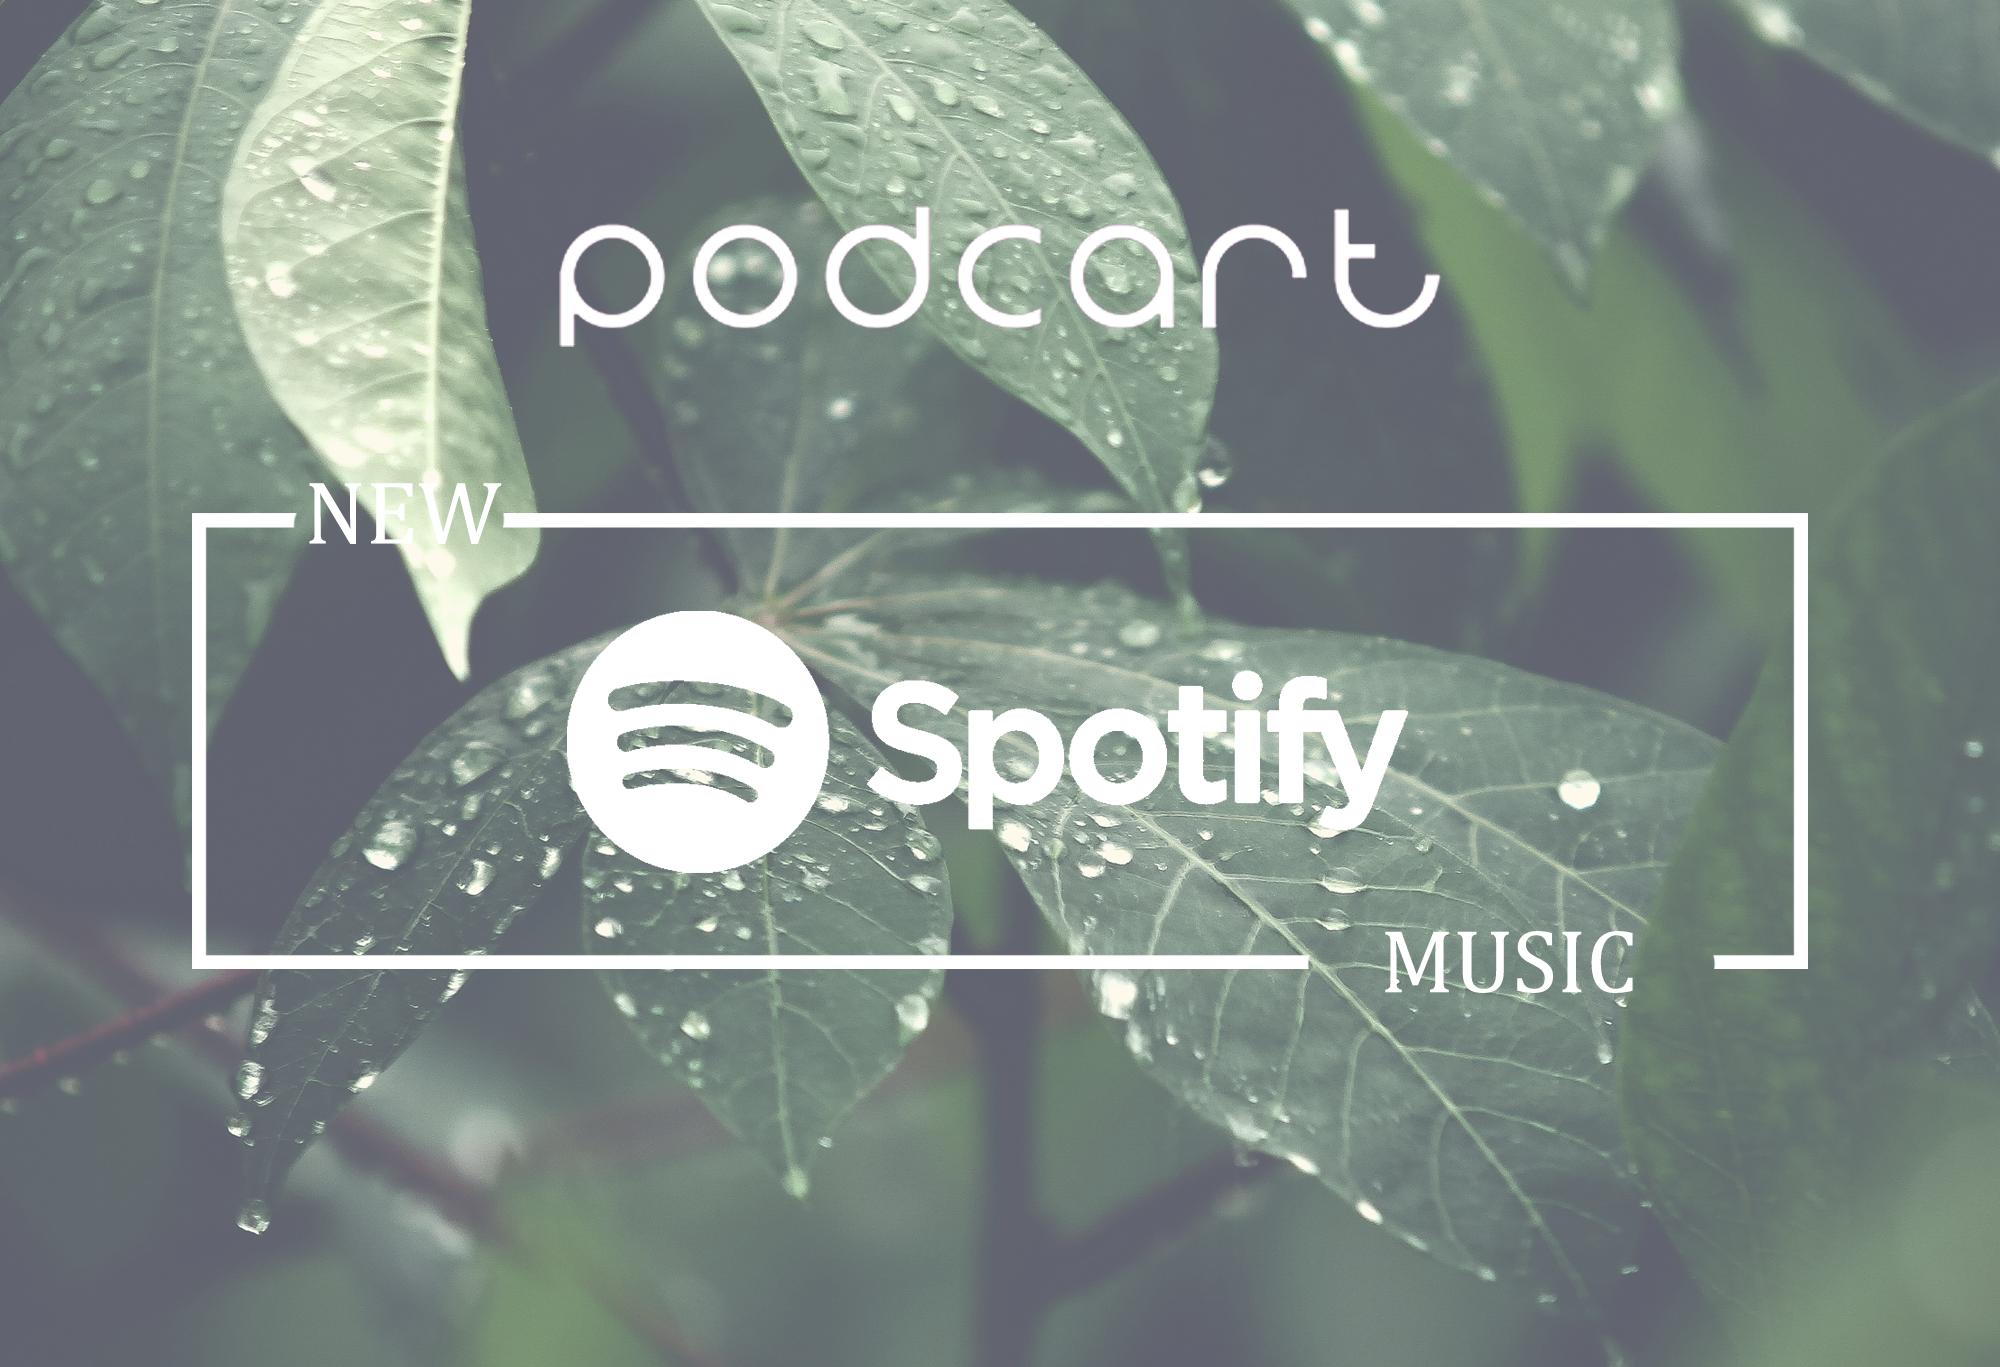 Podcart's Spotify Playlist 17